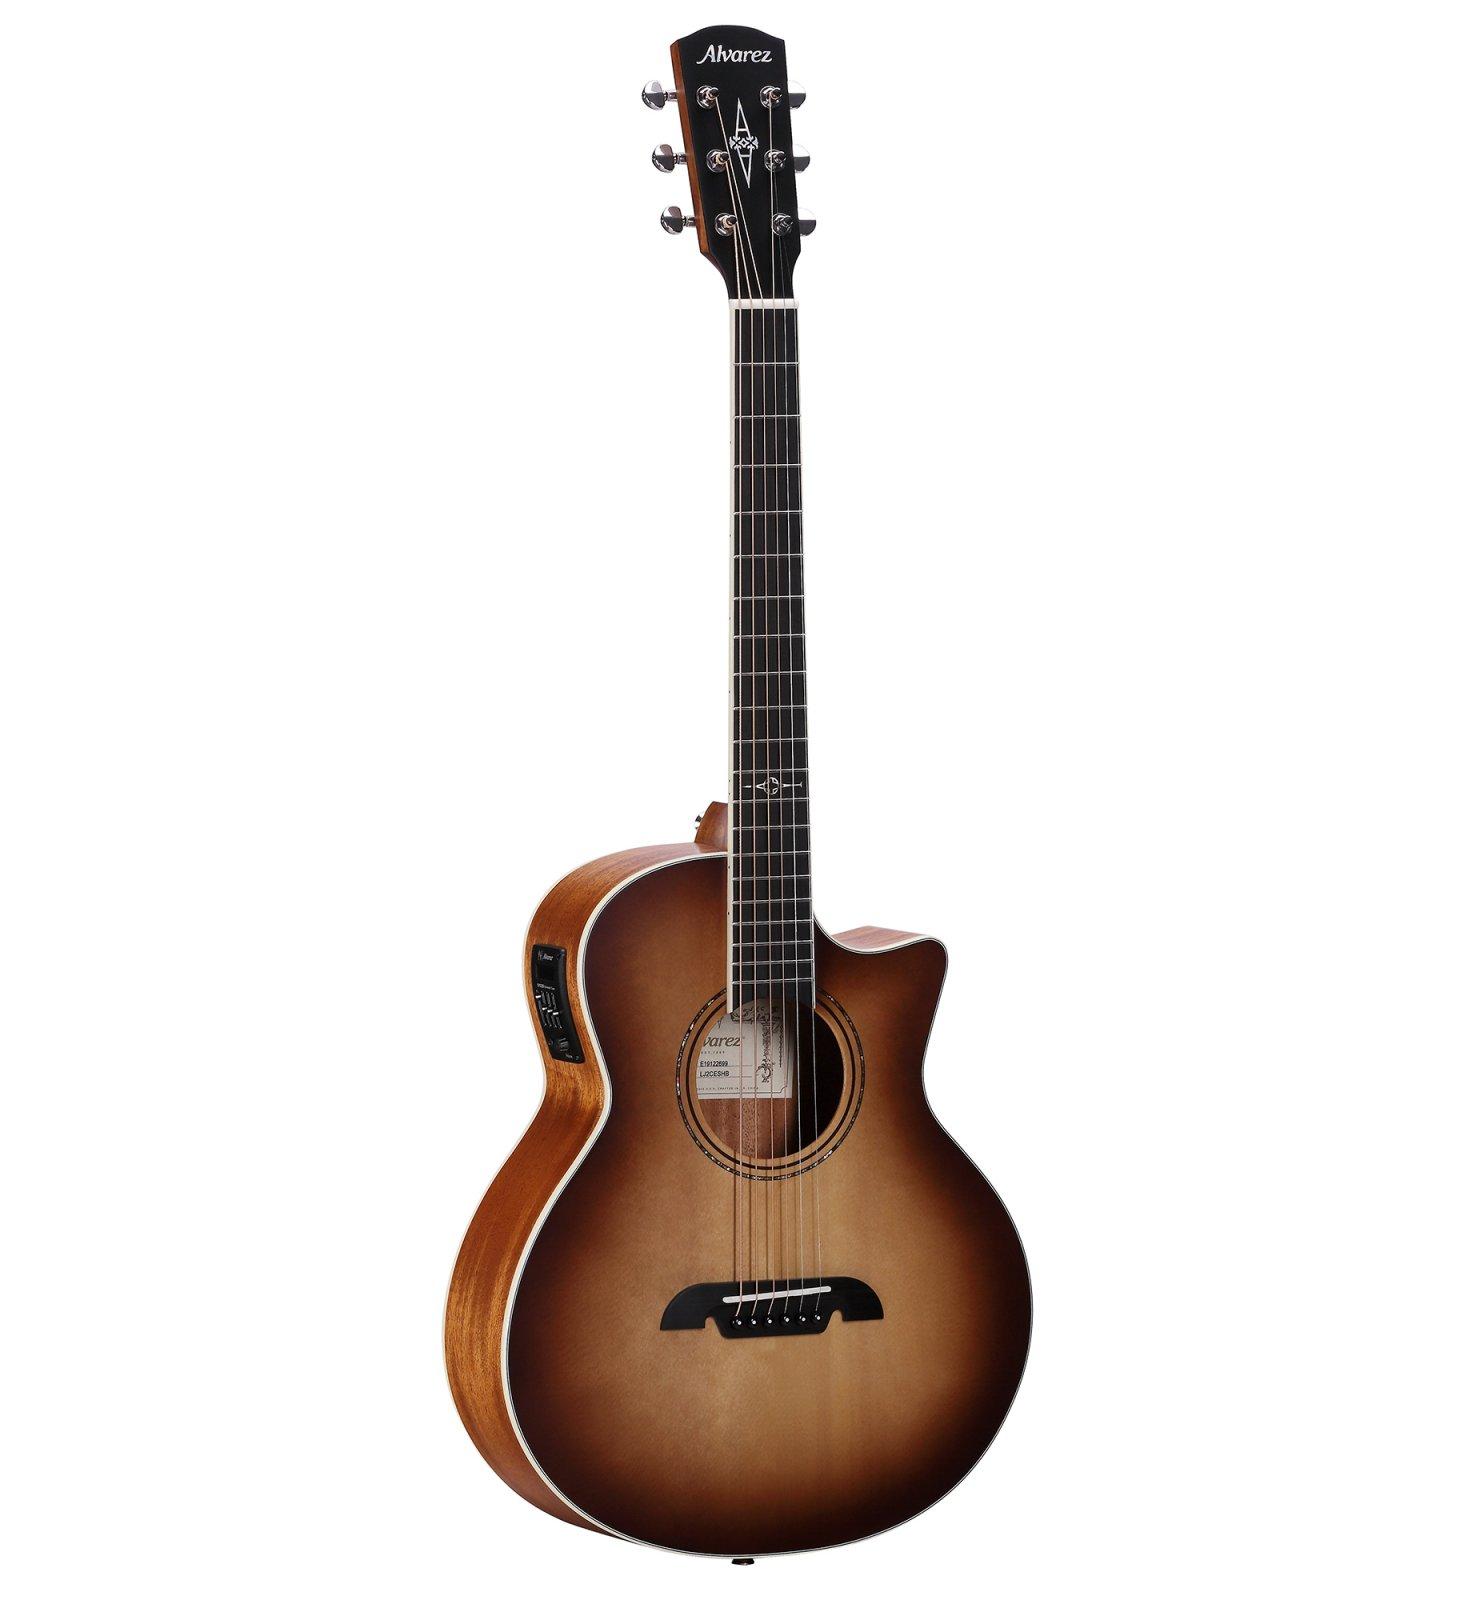 Alvarez Little Jumbo Travel Guitar_LJ2CESHB